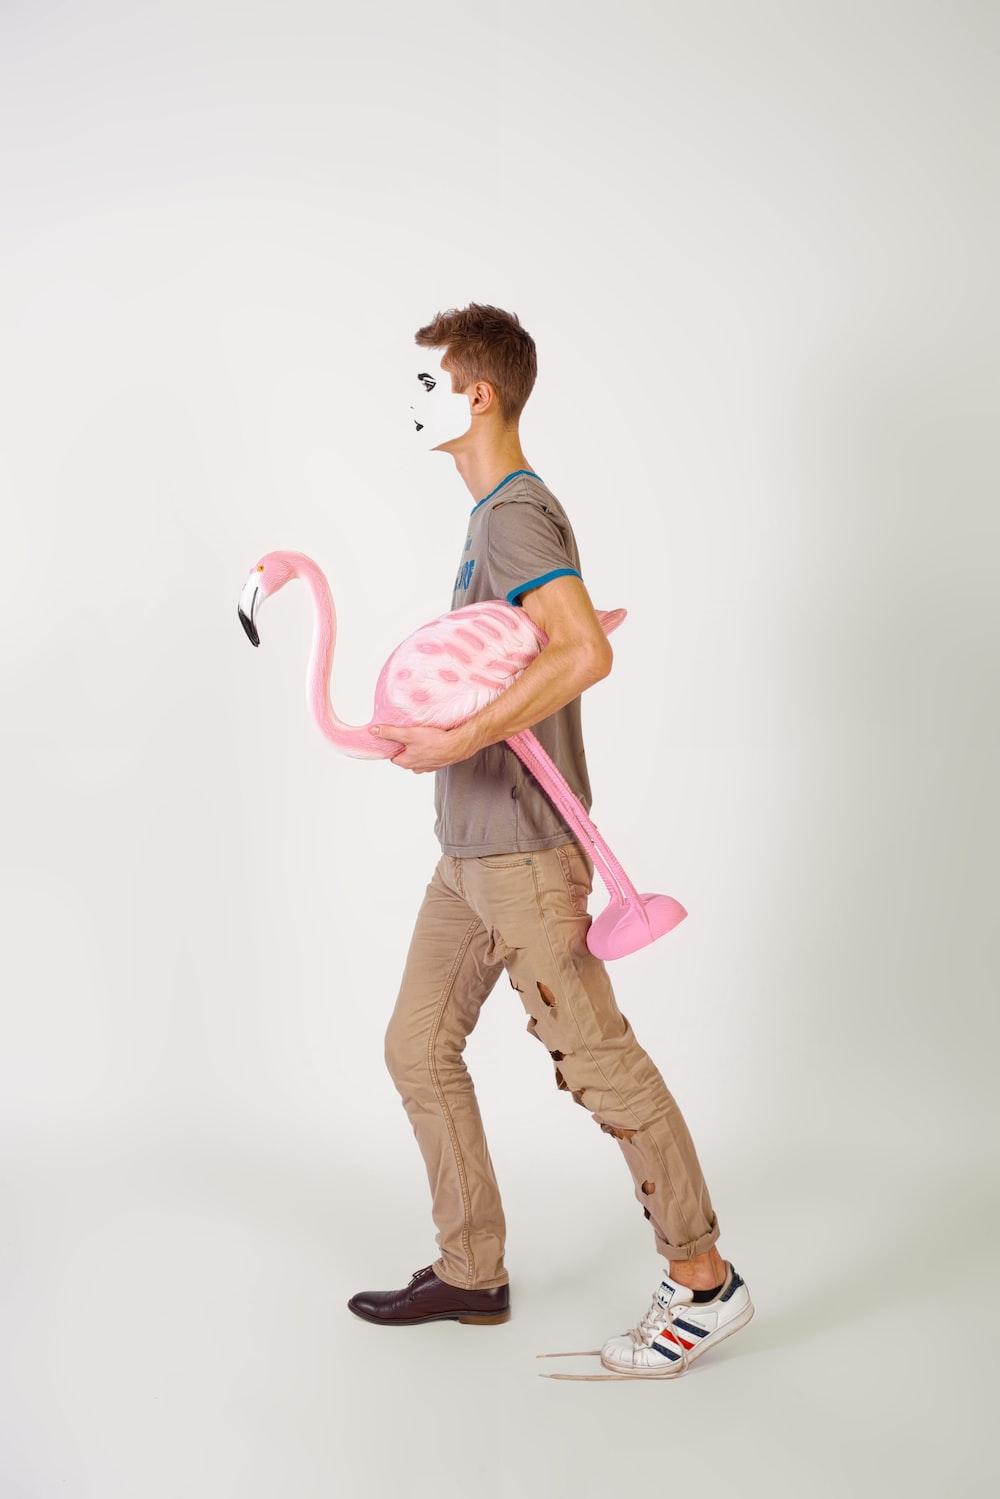 man carrying flamingo ornament illustration